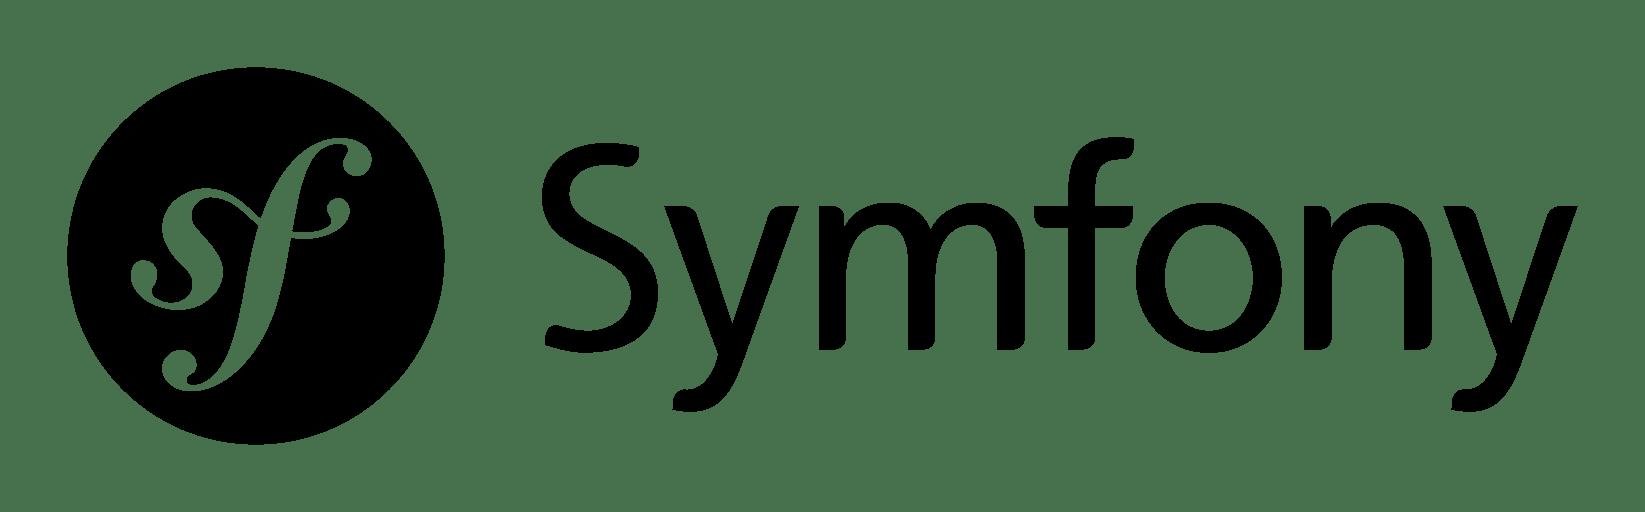 Symfony Logo transparent PNG - StickPNG